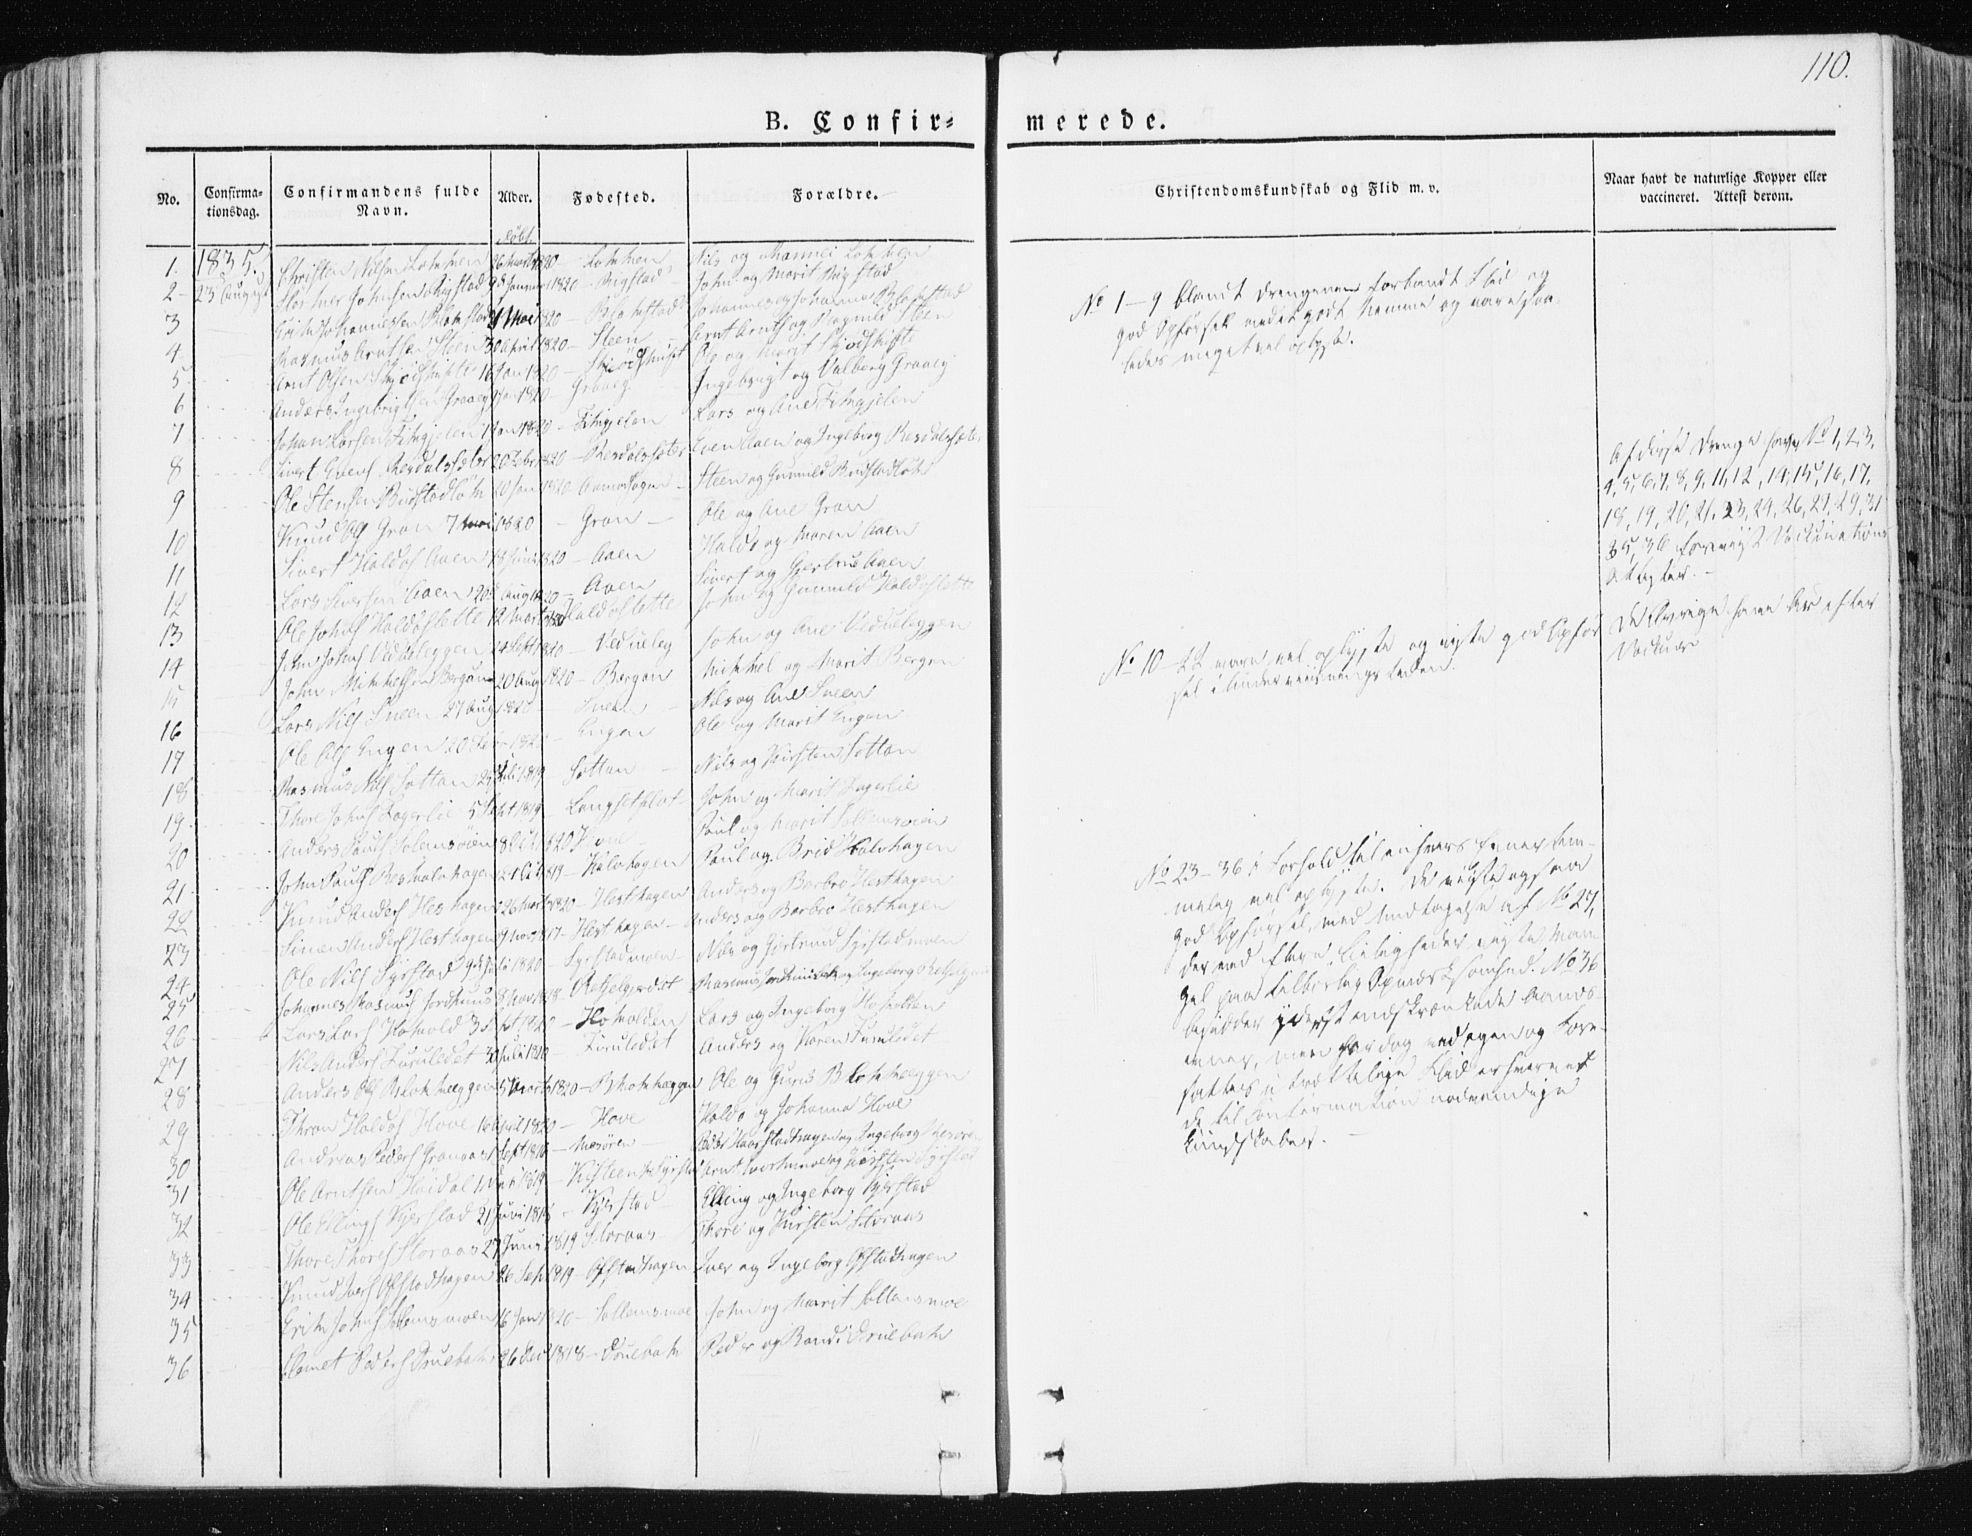 SAT, Ministerialprotokoller, klokkerbøker og fødselsregistre - Sør-Trøndelag, 672/L0855: Parish register (official) no. 672A07, 1829-1860, p. 110